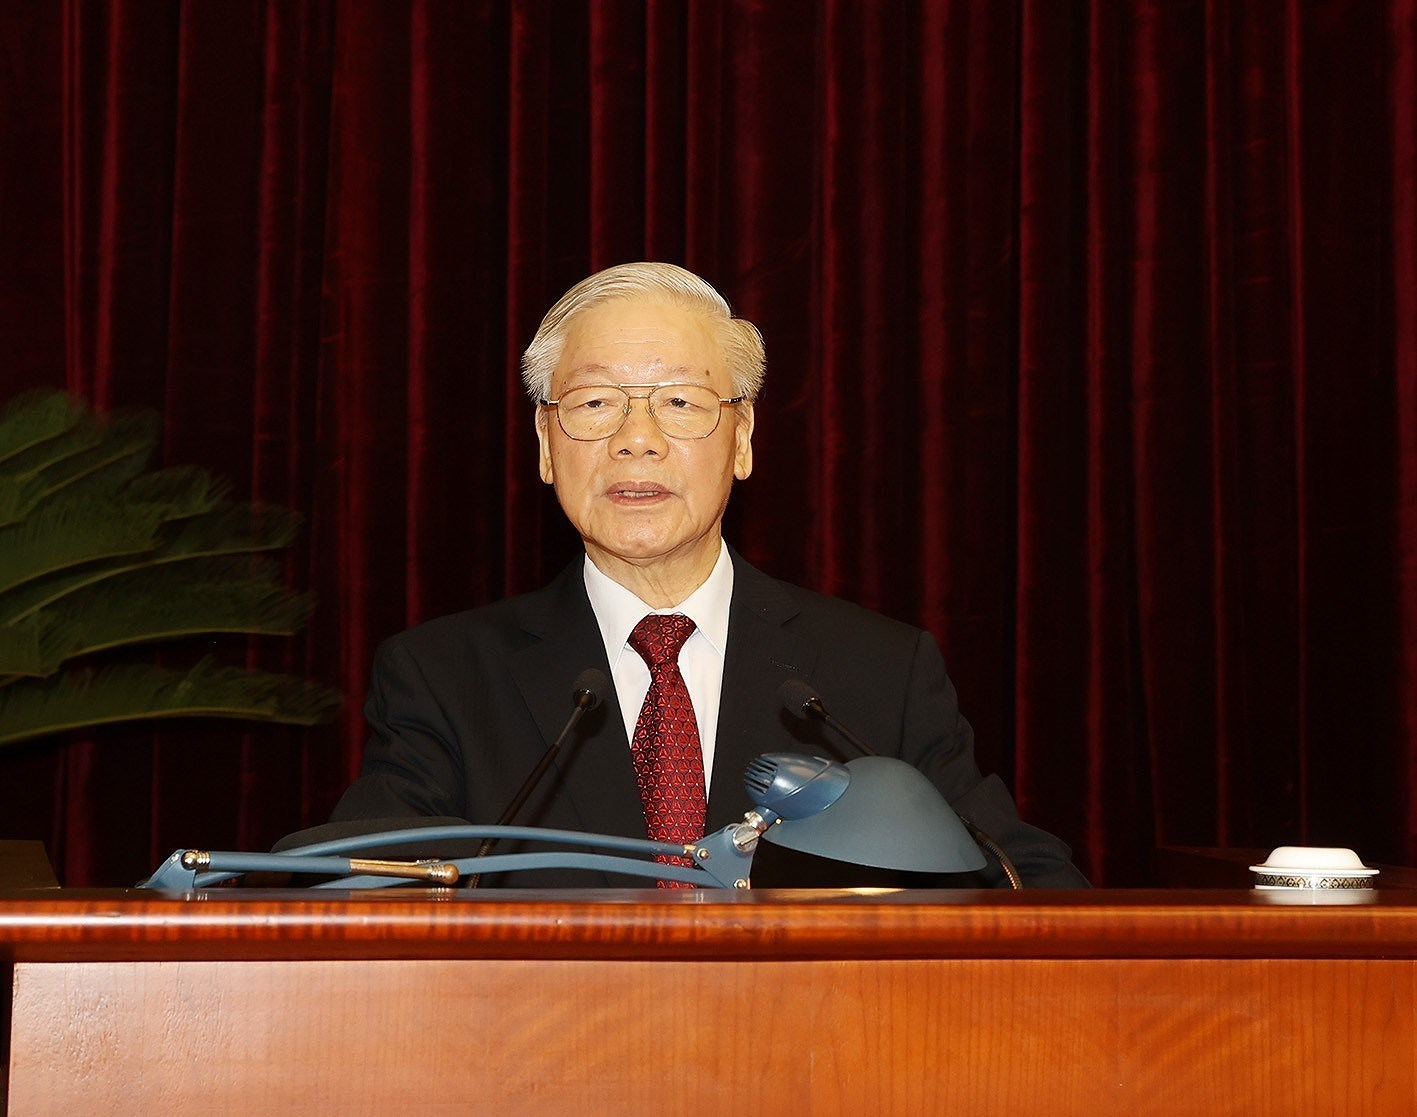 [Photo] Hoi nghi lan thu tu Ban Chap hanh Trung uong Dang khoa XIII hinh anh 9